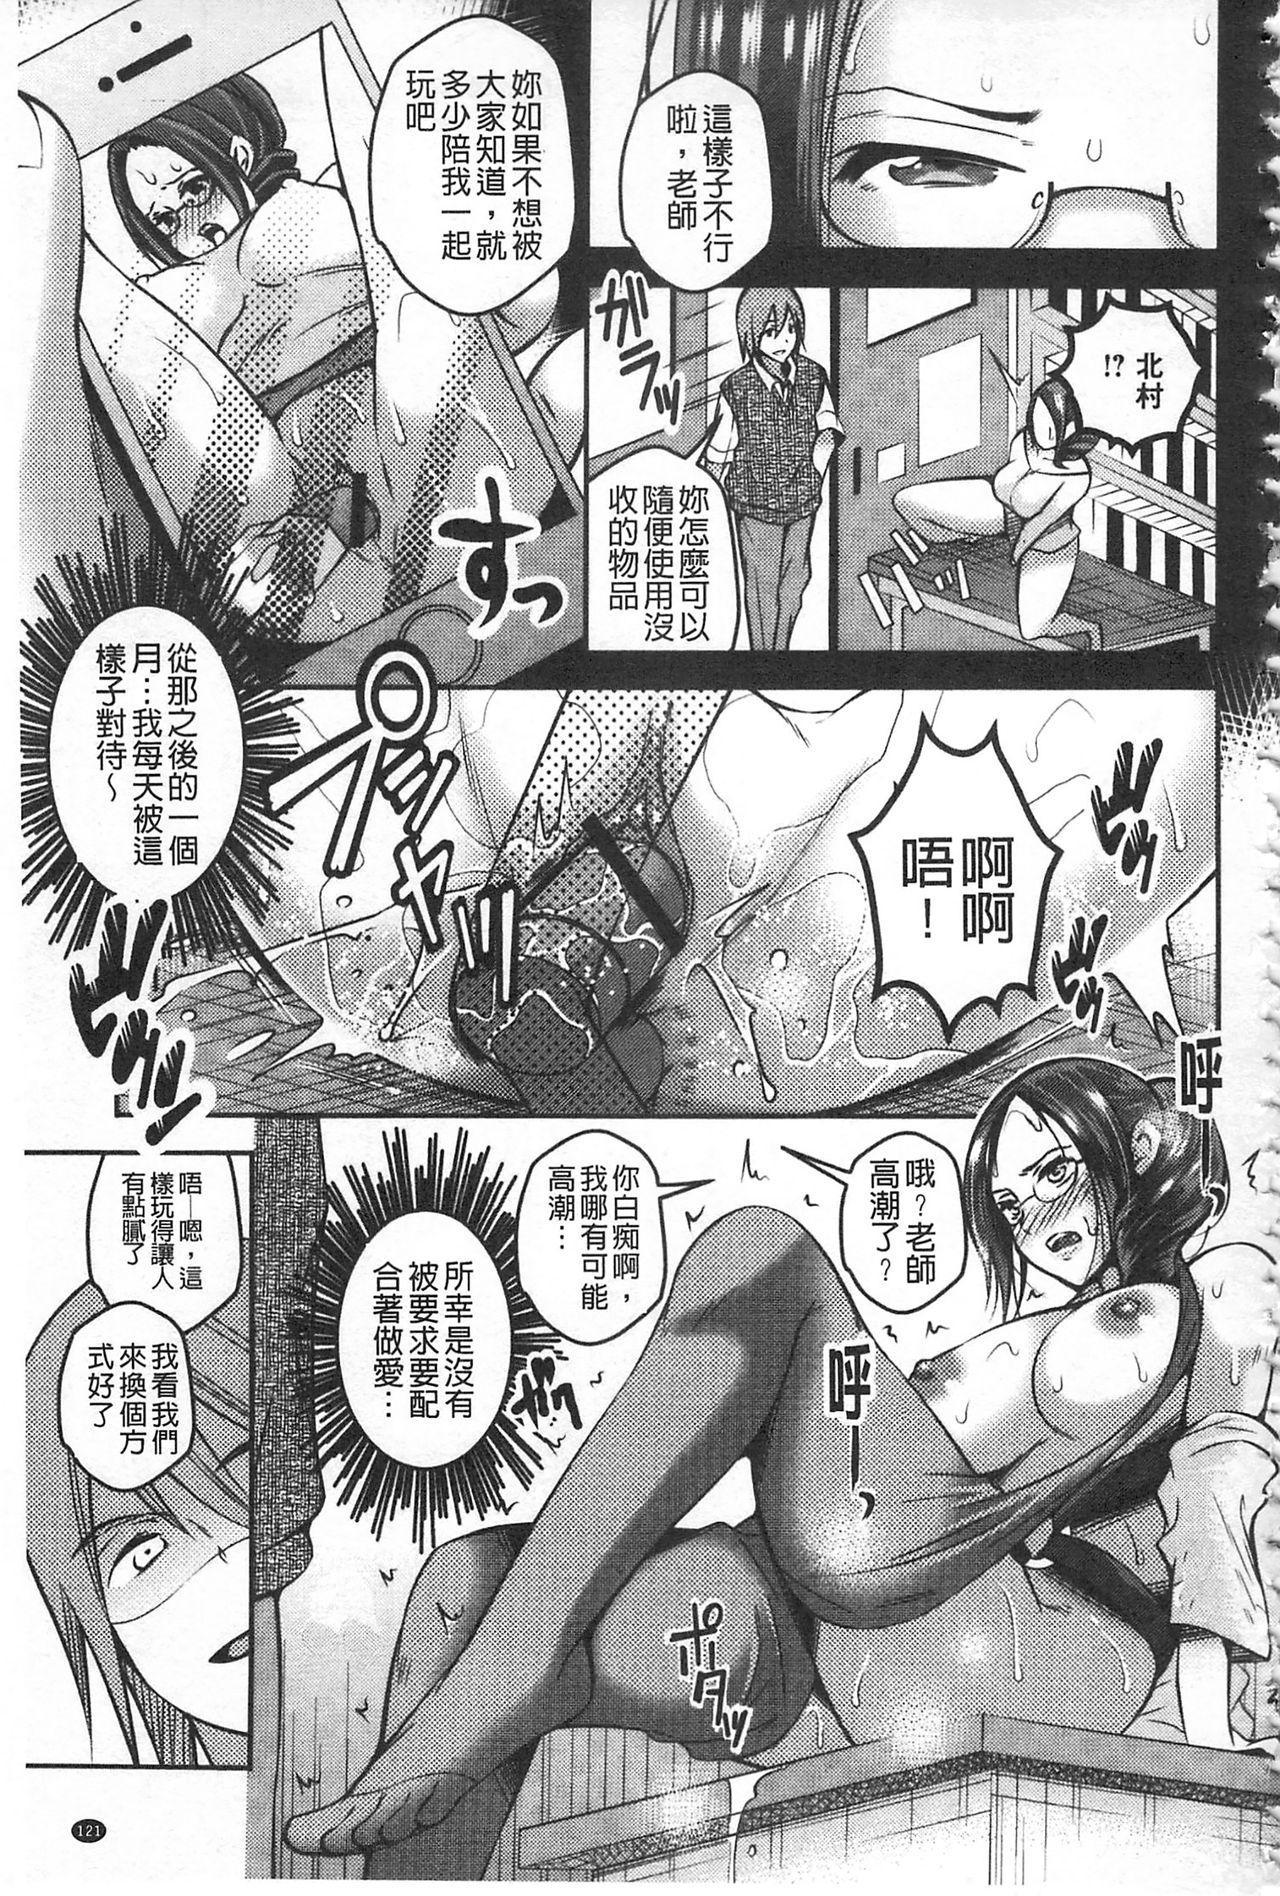 Kanjuku Otome no Odoshikata | 姦熟乙女的脅迫法 122